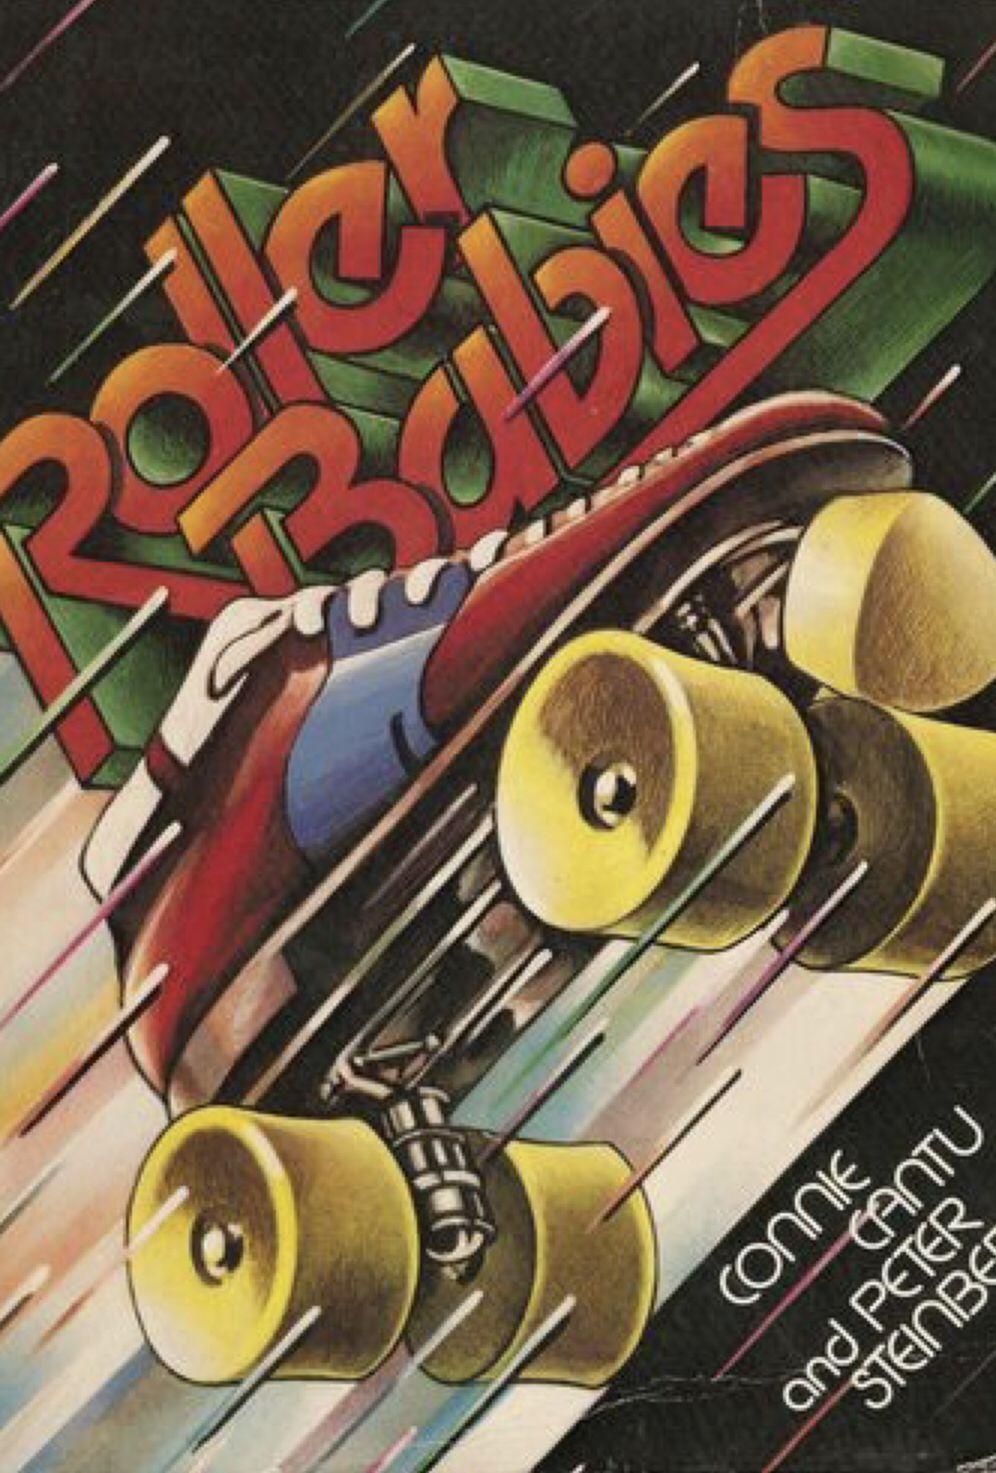 Pin By Ritab3 On Disco Roller Derby Art Roller Derby Skates Roller Derby